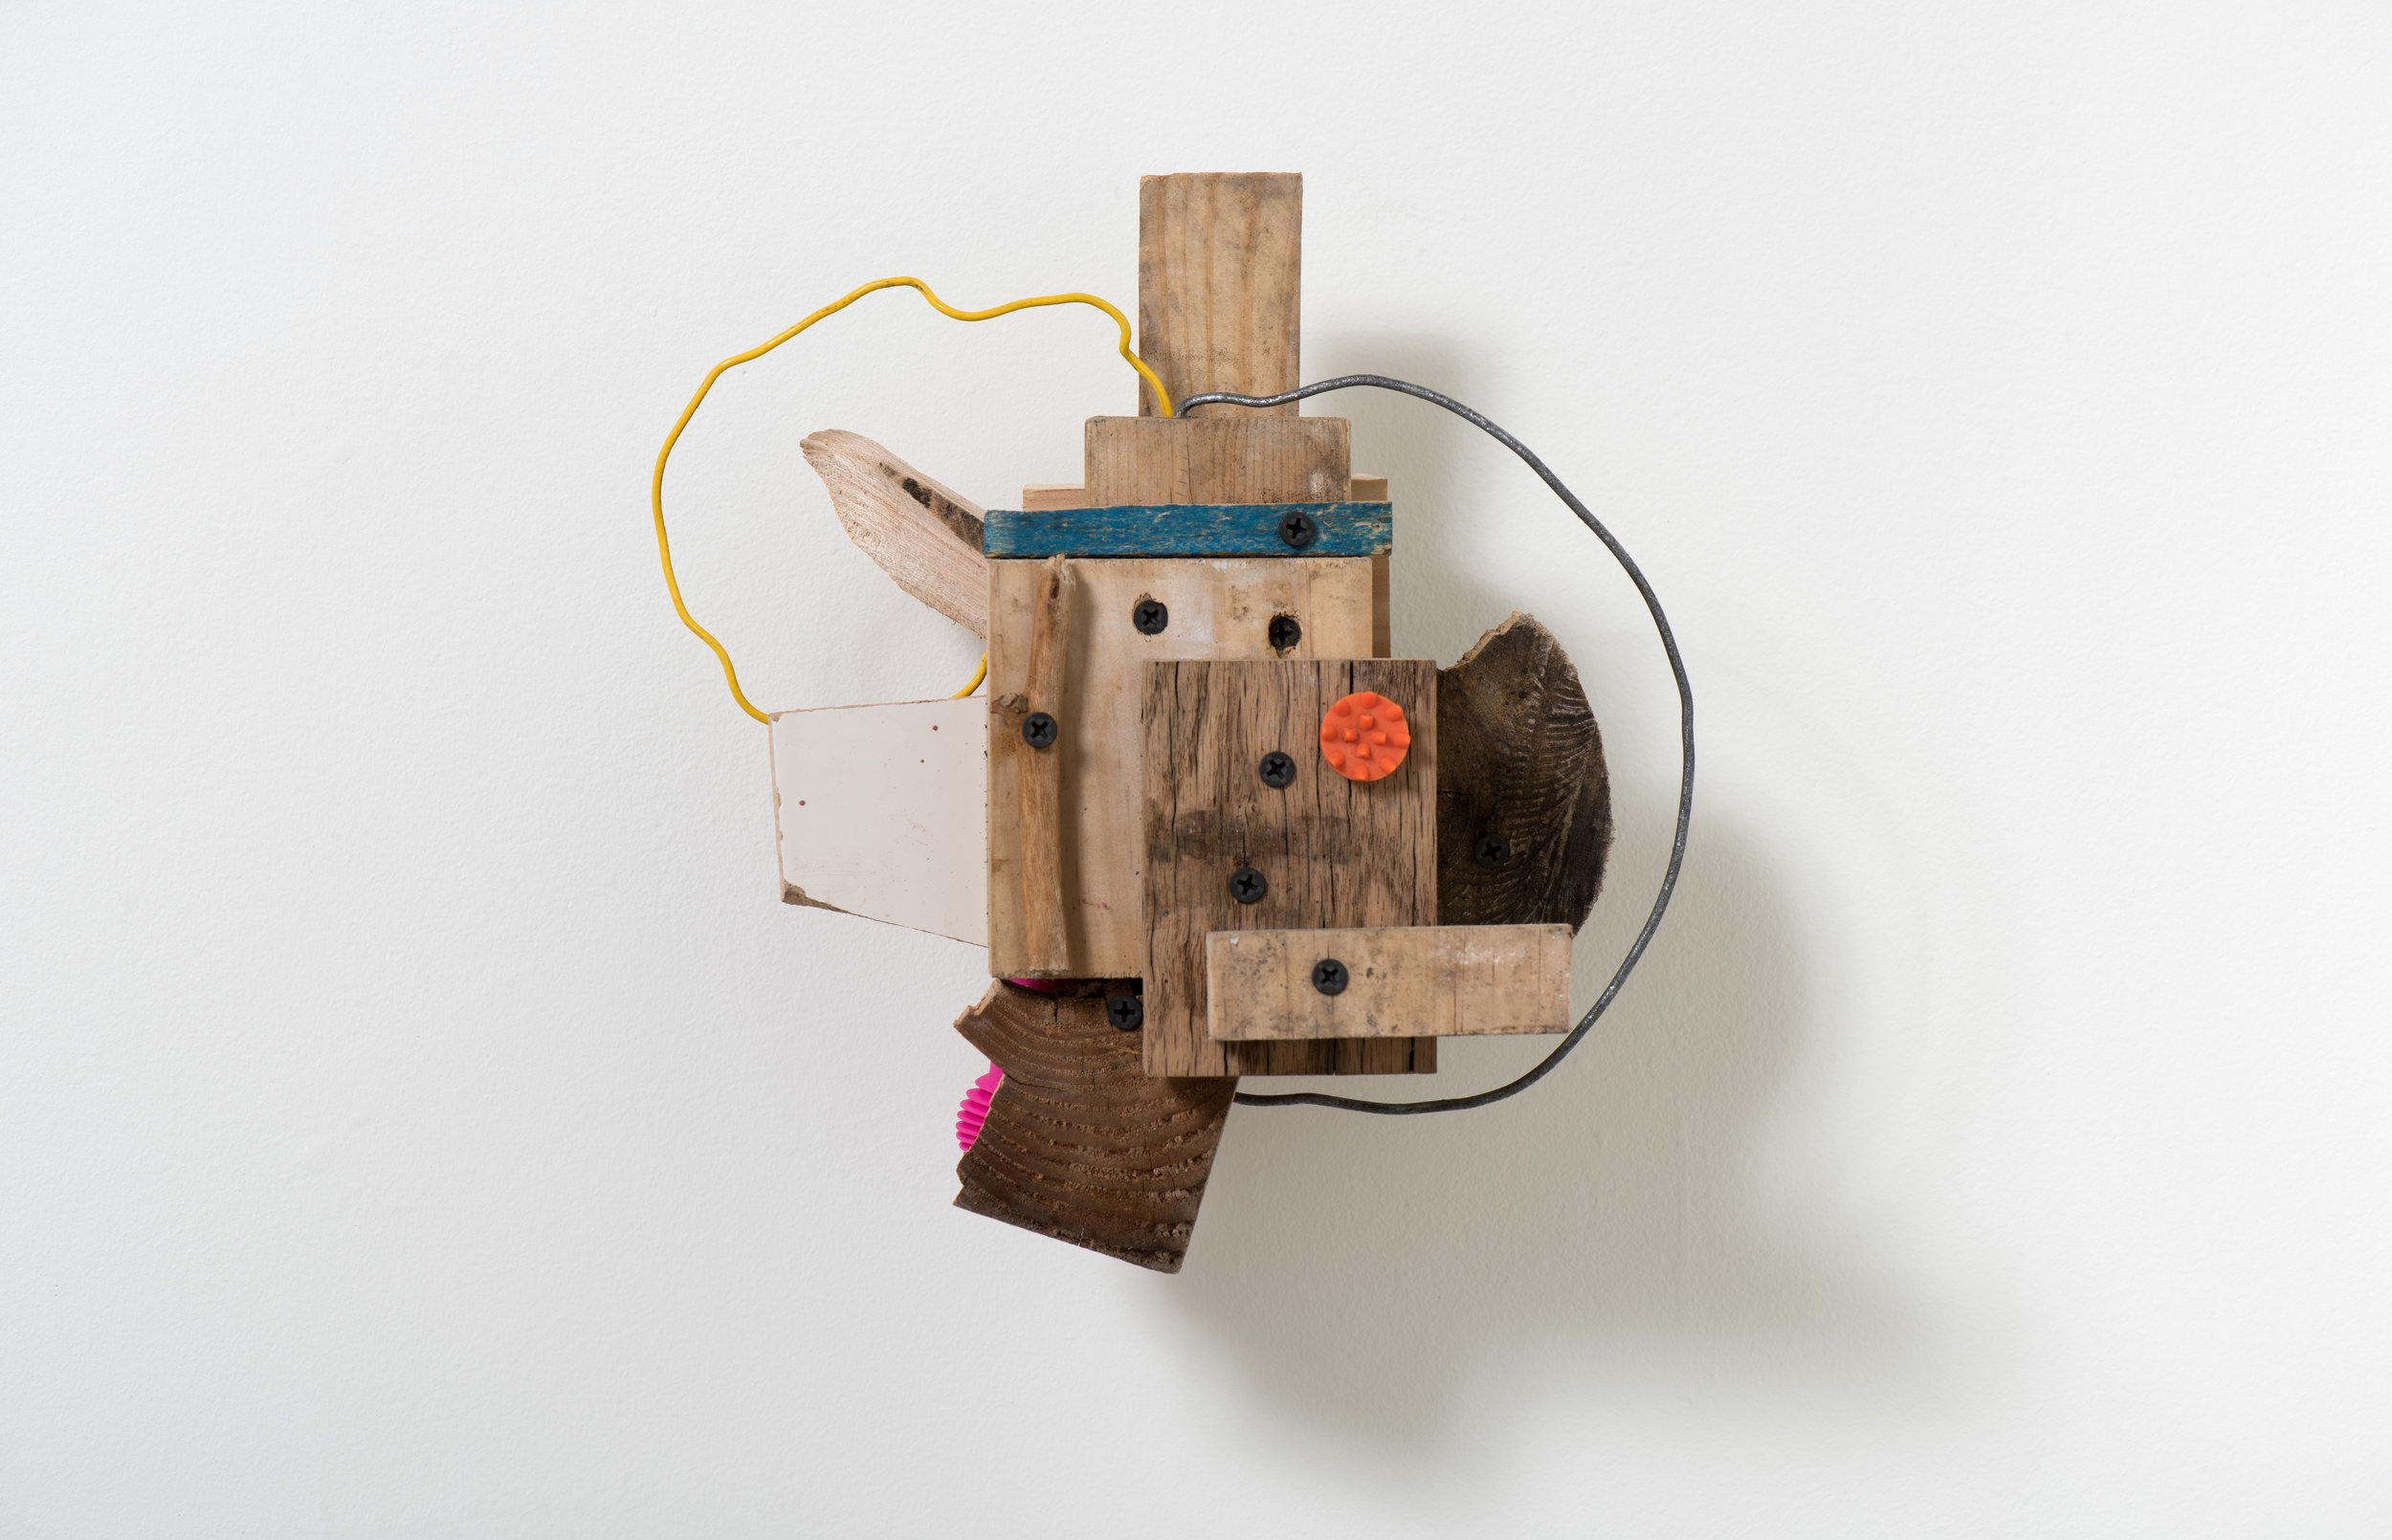 Ian L.C. Swordy  Everyday Eternal , 2019 Found objects, hardware 9 x 10 x 6 1/2 inches